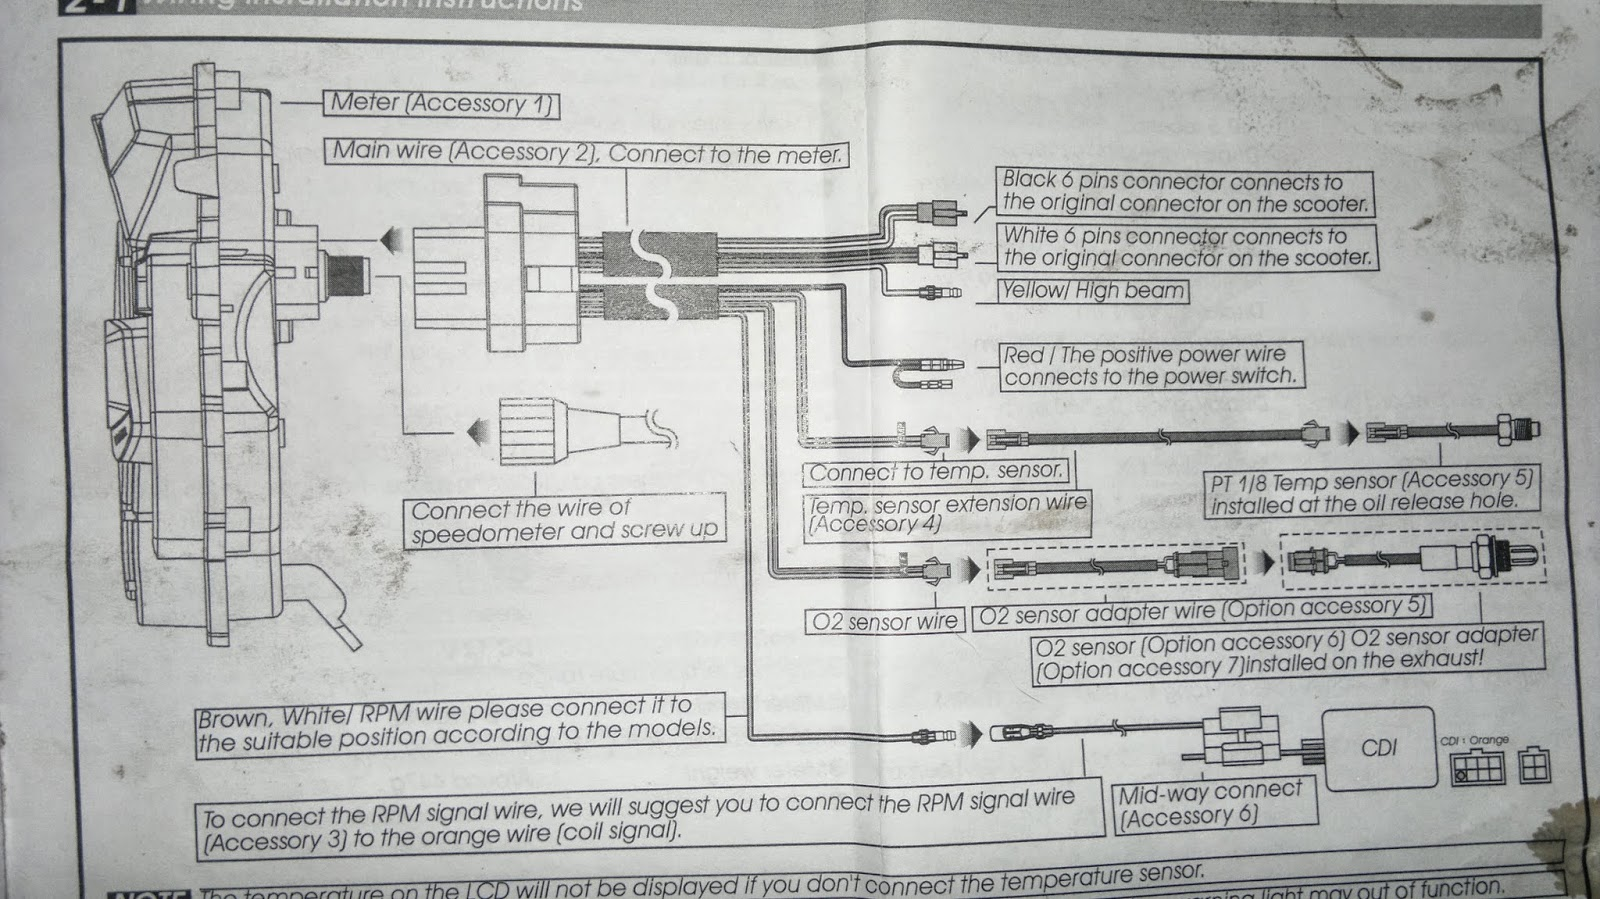 Wiring installation instructions (uma racing digital meter LC135)